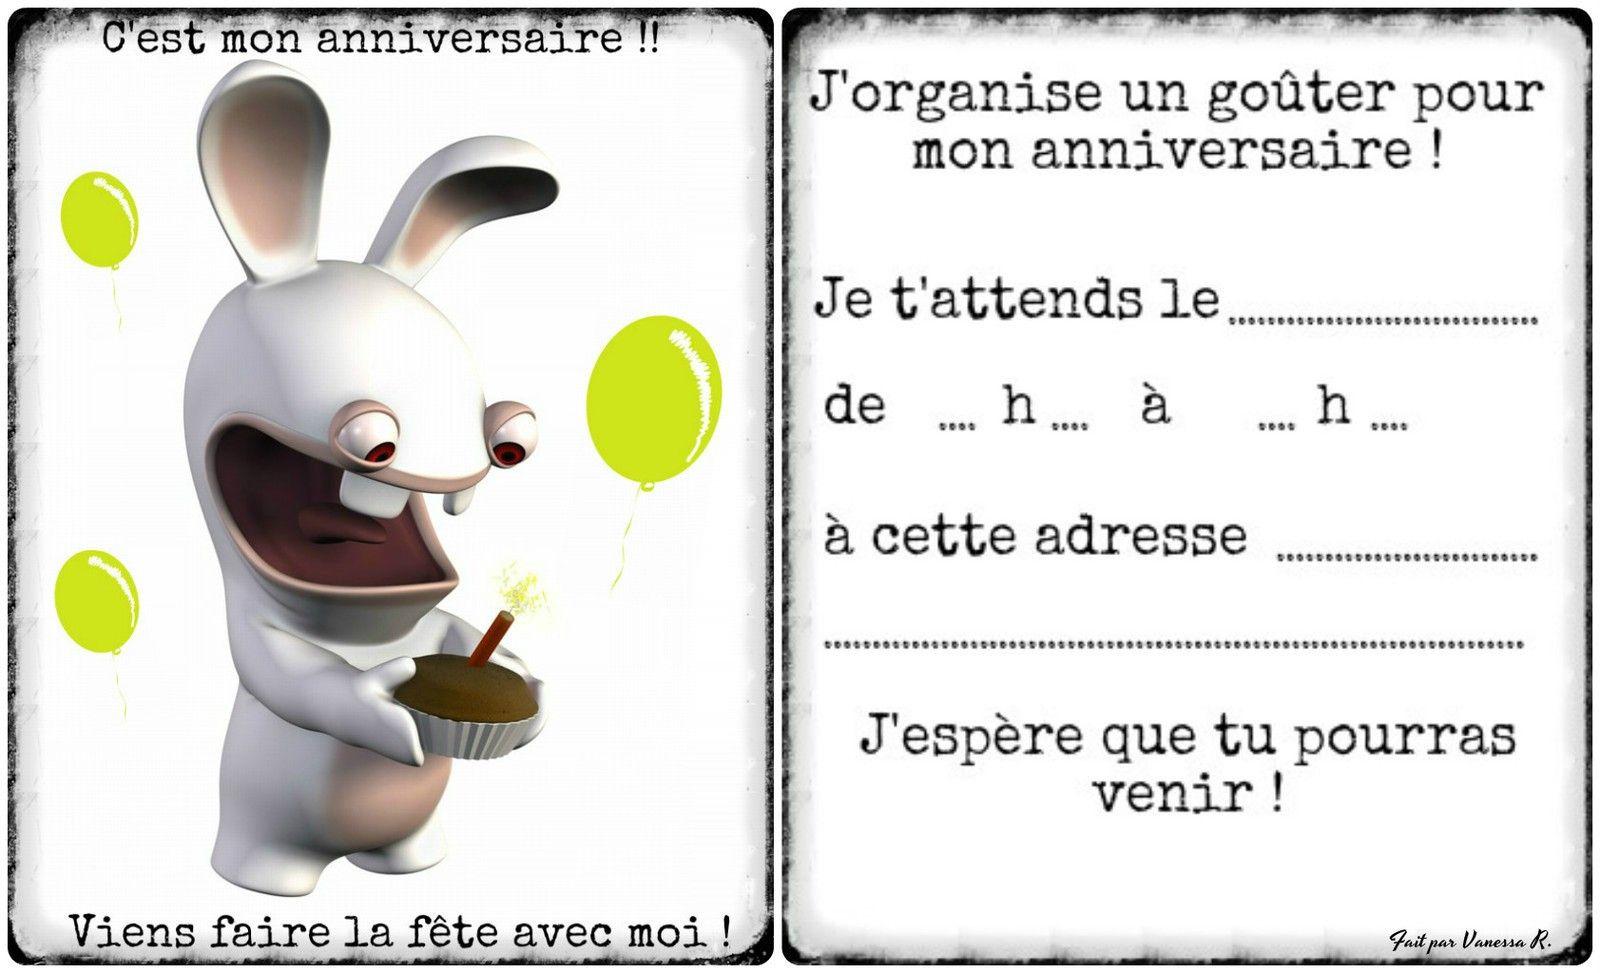 gyarto kozpont pozitiv bumm invitation anniversaire garcon 10 ans amazon